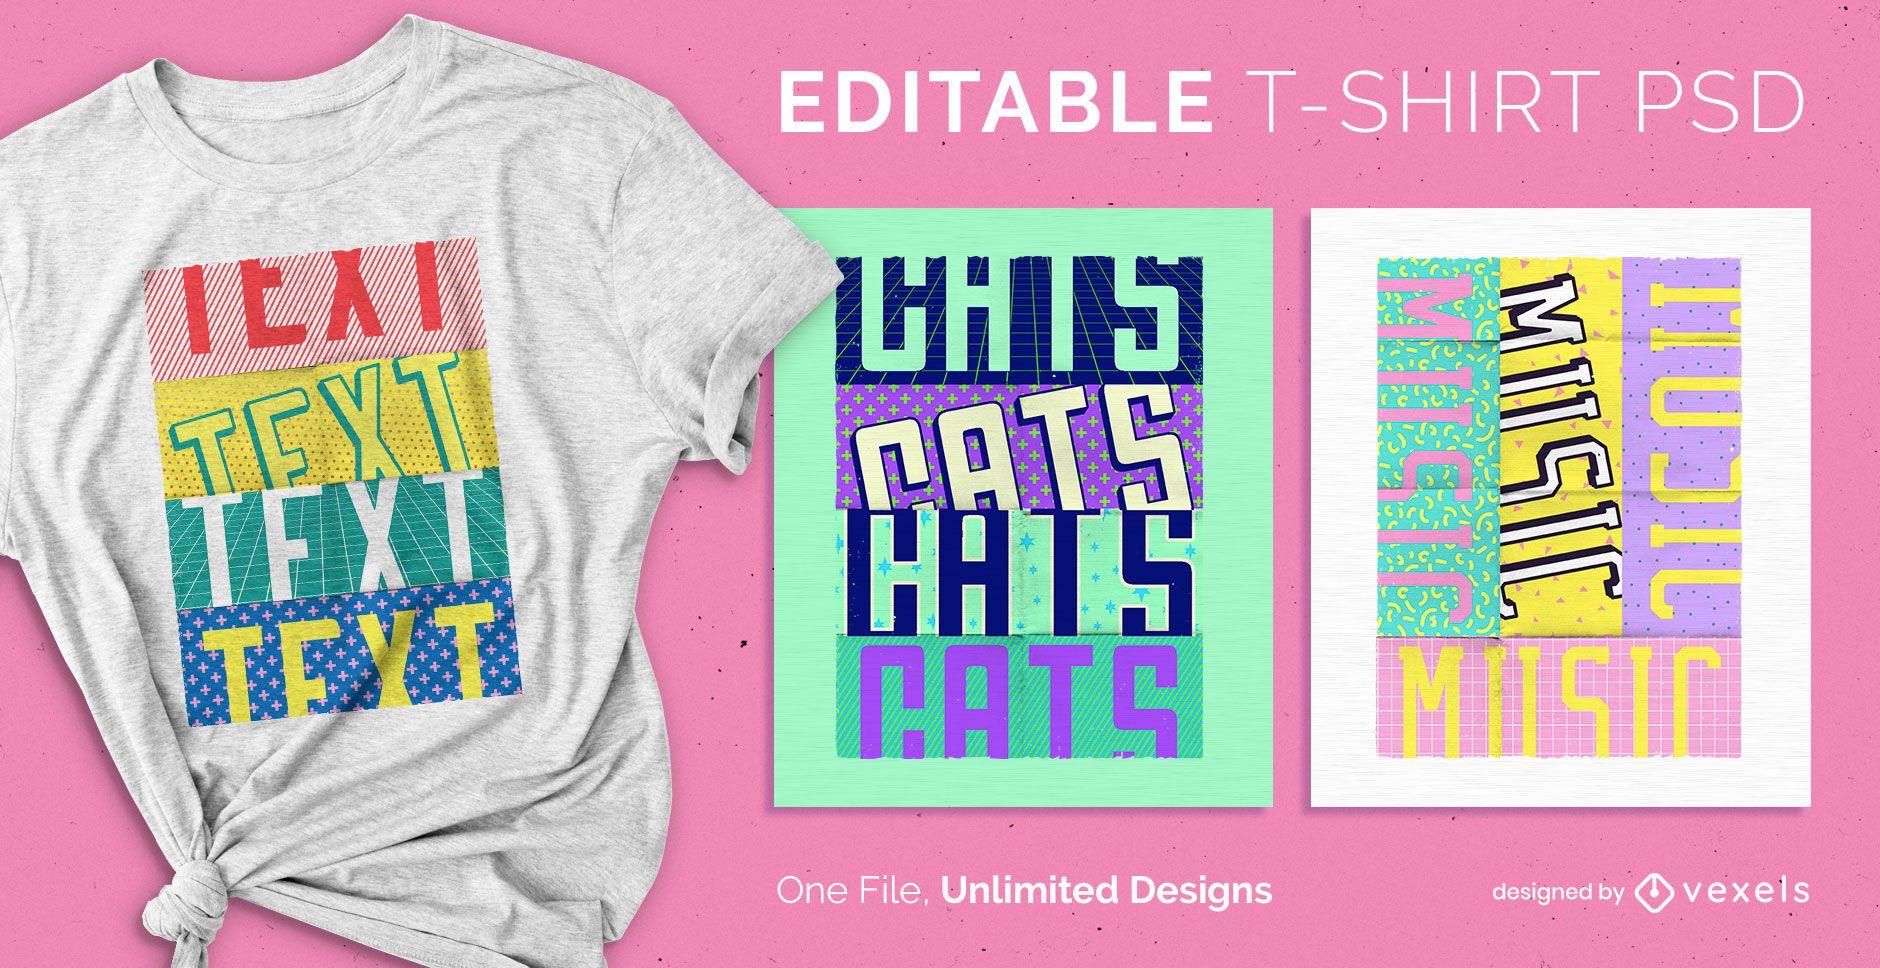 Pop text scalable t-shirt psd